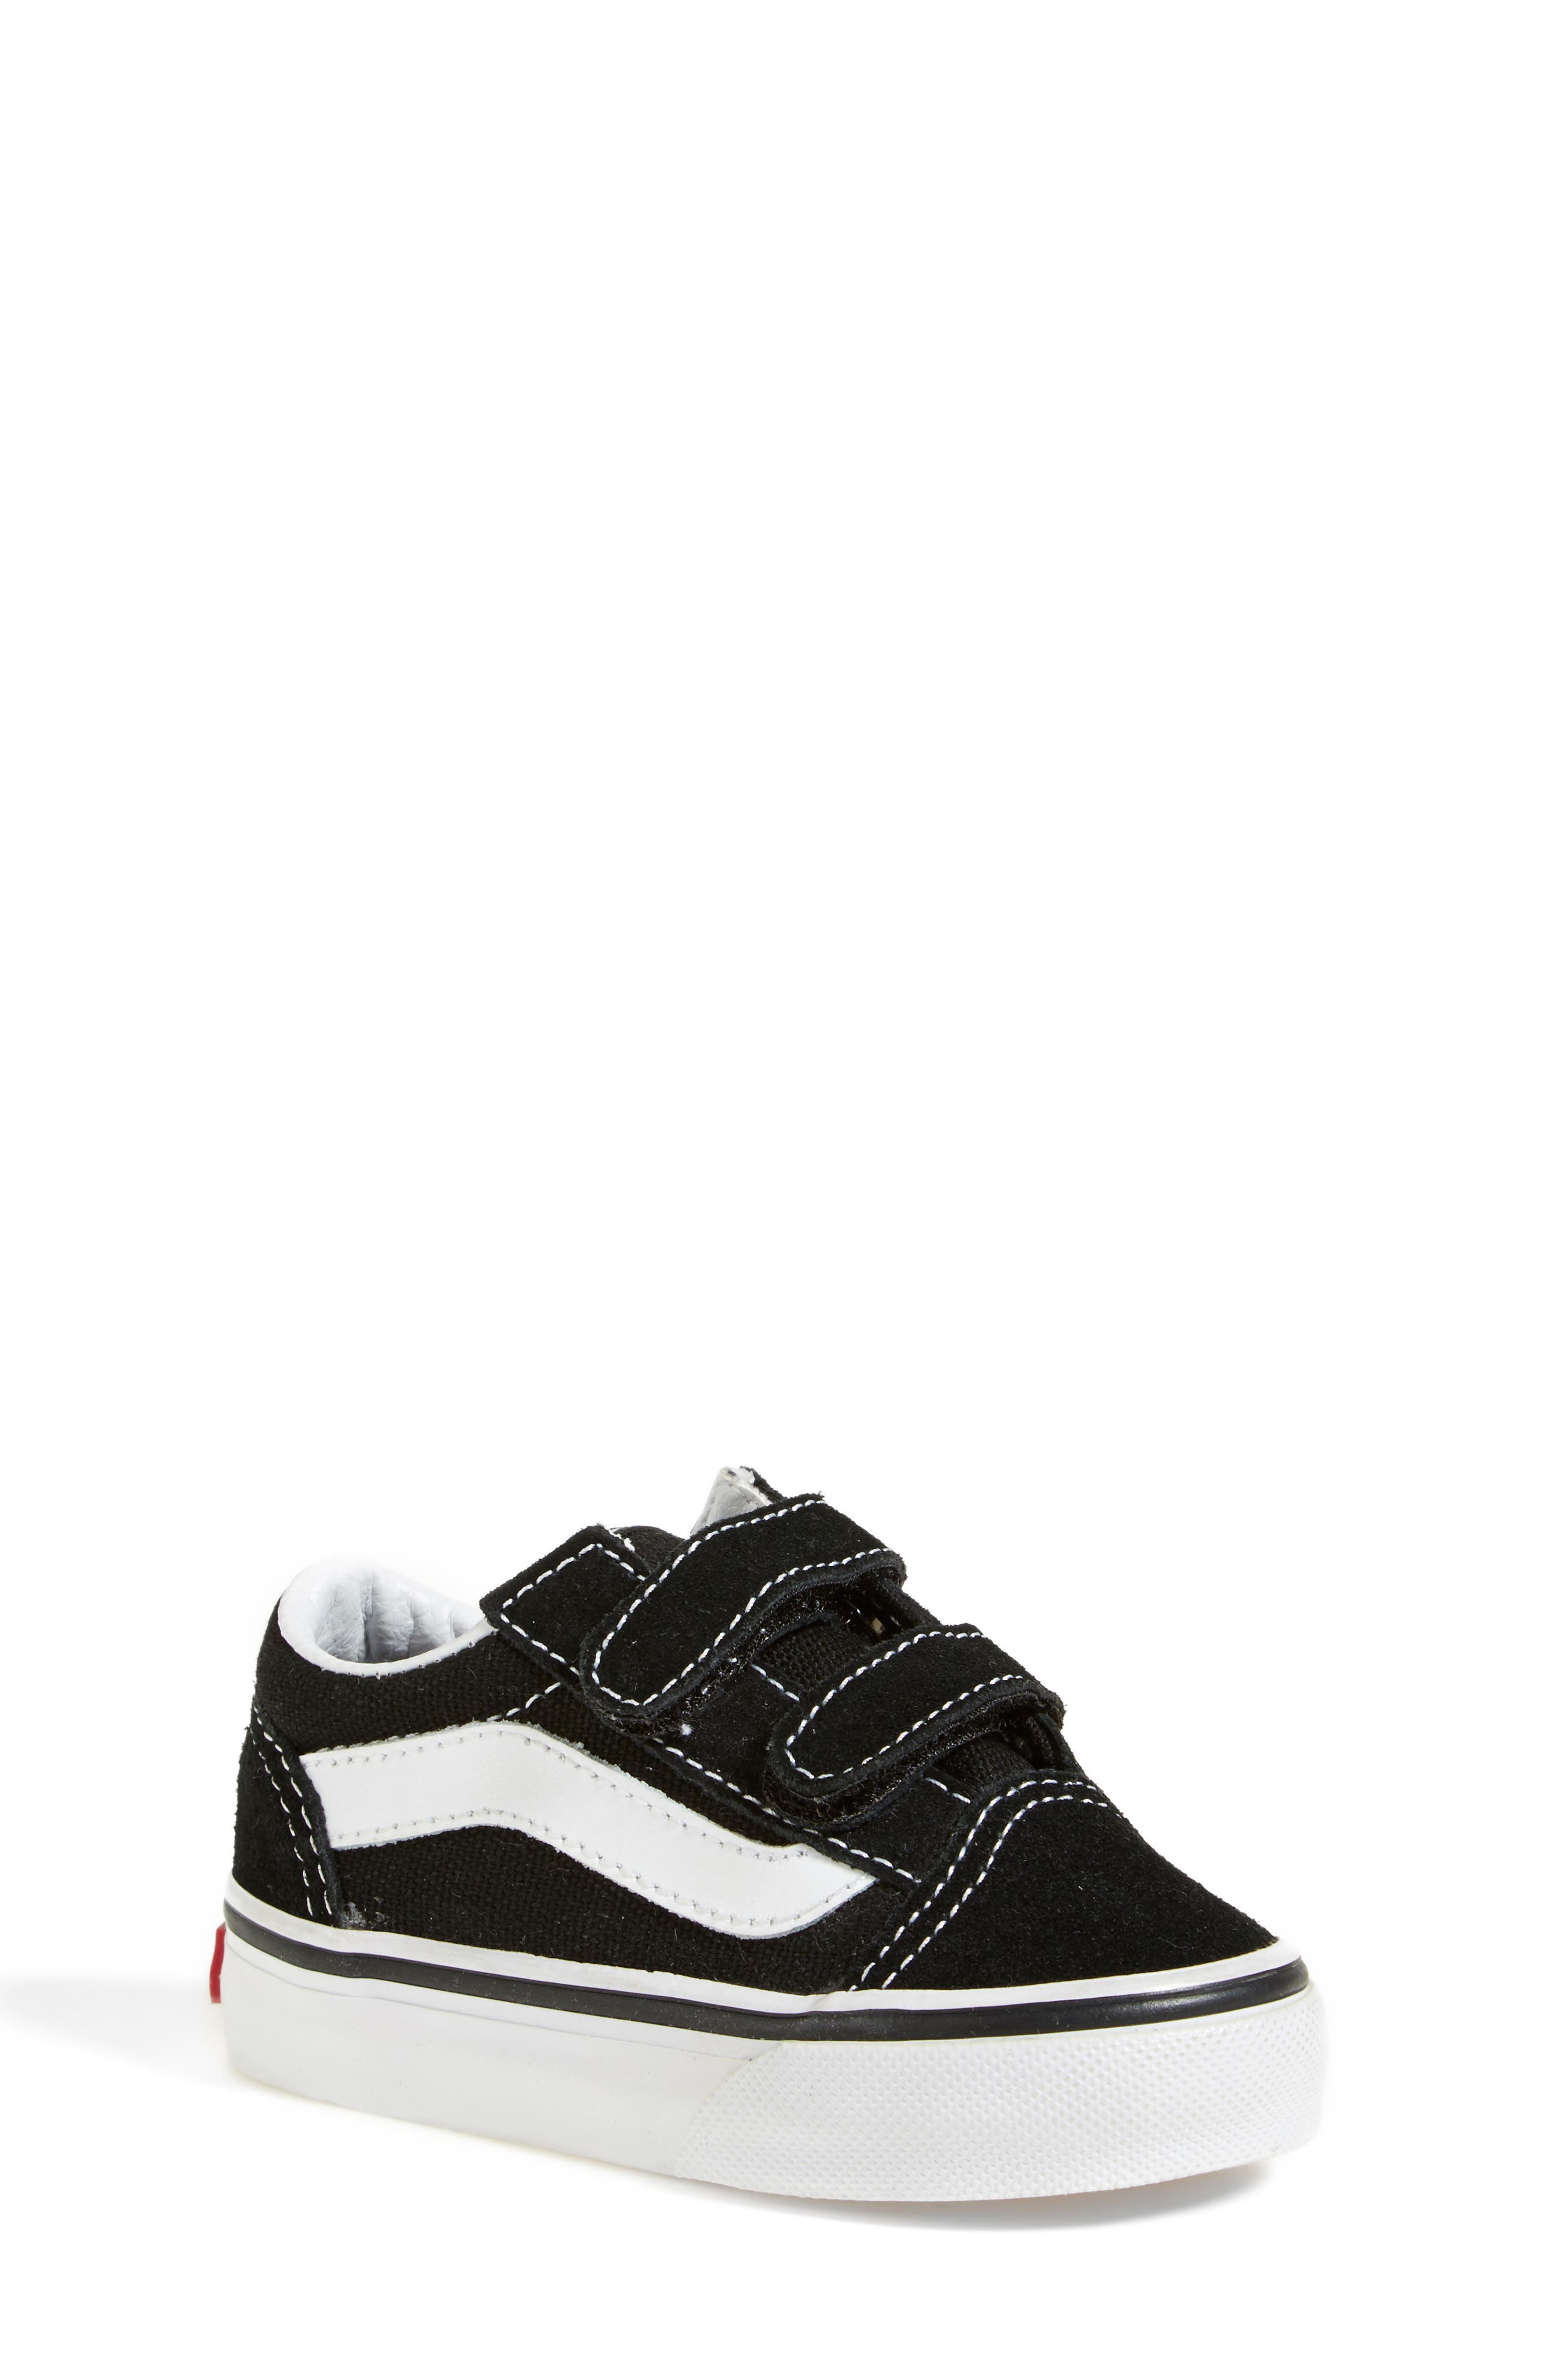 'Old Skool' Sneaker,                             Main thumbnail 1, color,                             Black